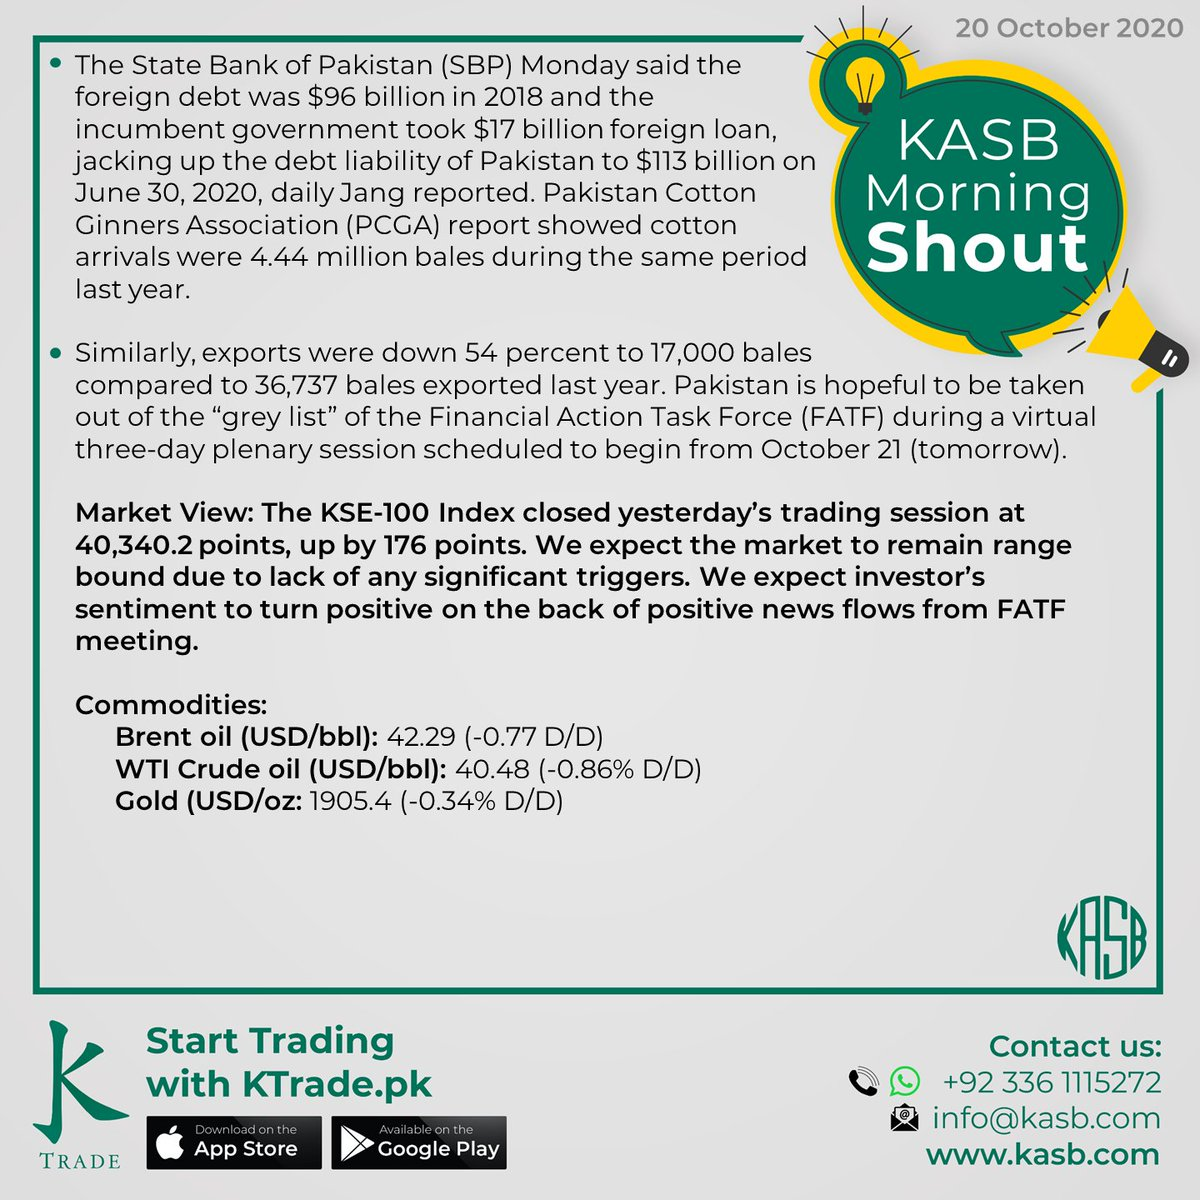 KASB Morning Shout: Our views on today's news #kasb #smartinvesting #psx #stockmarket #KTrade #onlinetrading #pakistaneconomy #imrankhan #sbp #inflation #kse100 #brokeragehouse #psxstocks #marketupdate #emergingmarkets #frontiermarkets #news #morning #today #views https://t.co/oArHzzzmFv